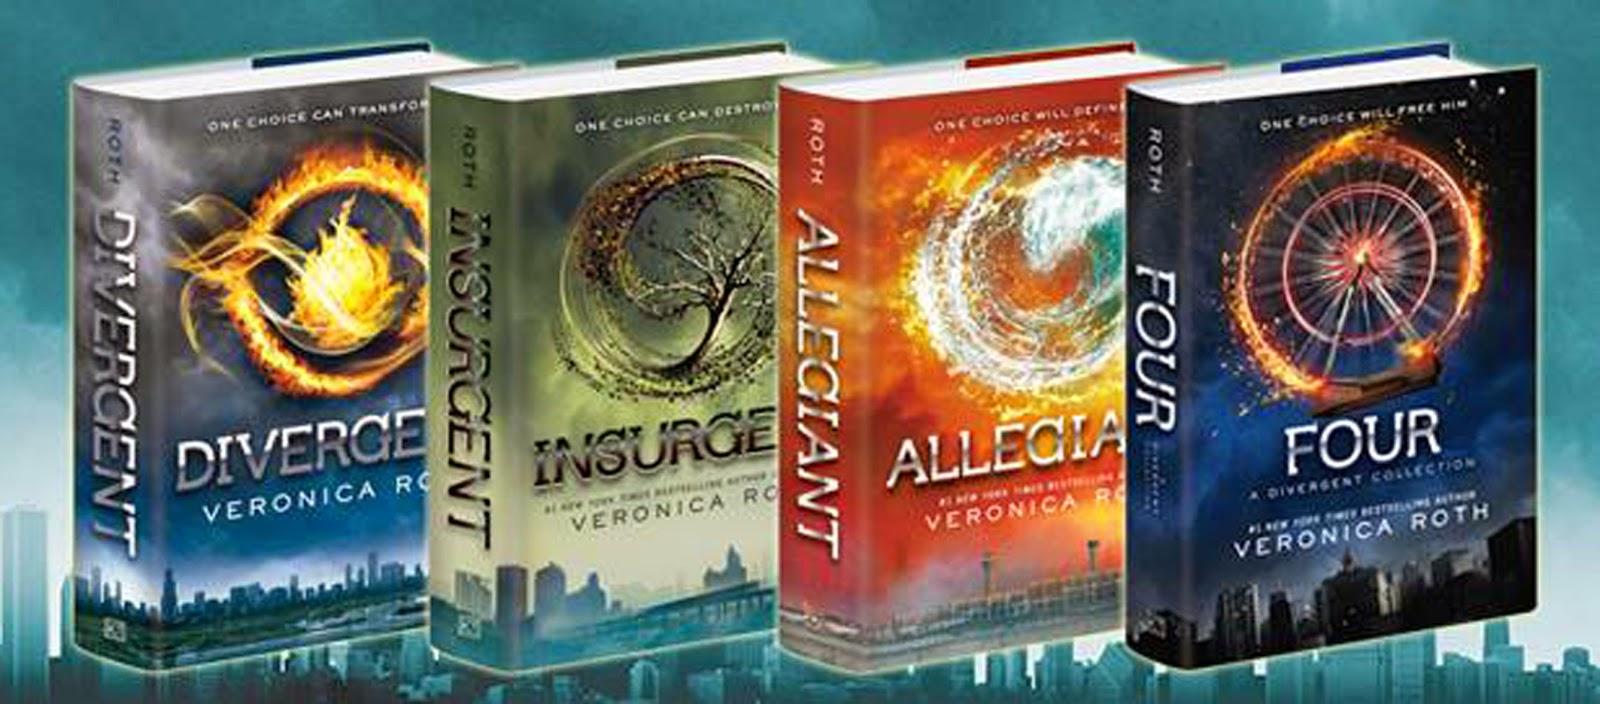 AskSeekKnock Reviews: Prettiest YA Book Covers! - 1600x704 - jpeg Divergent Book Cover Back